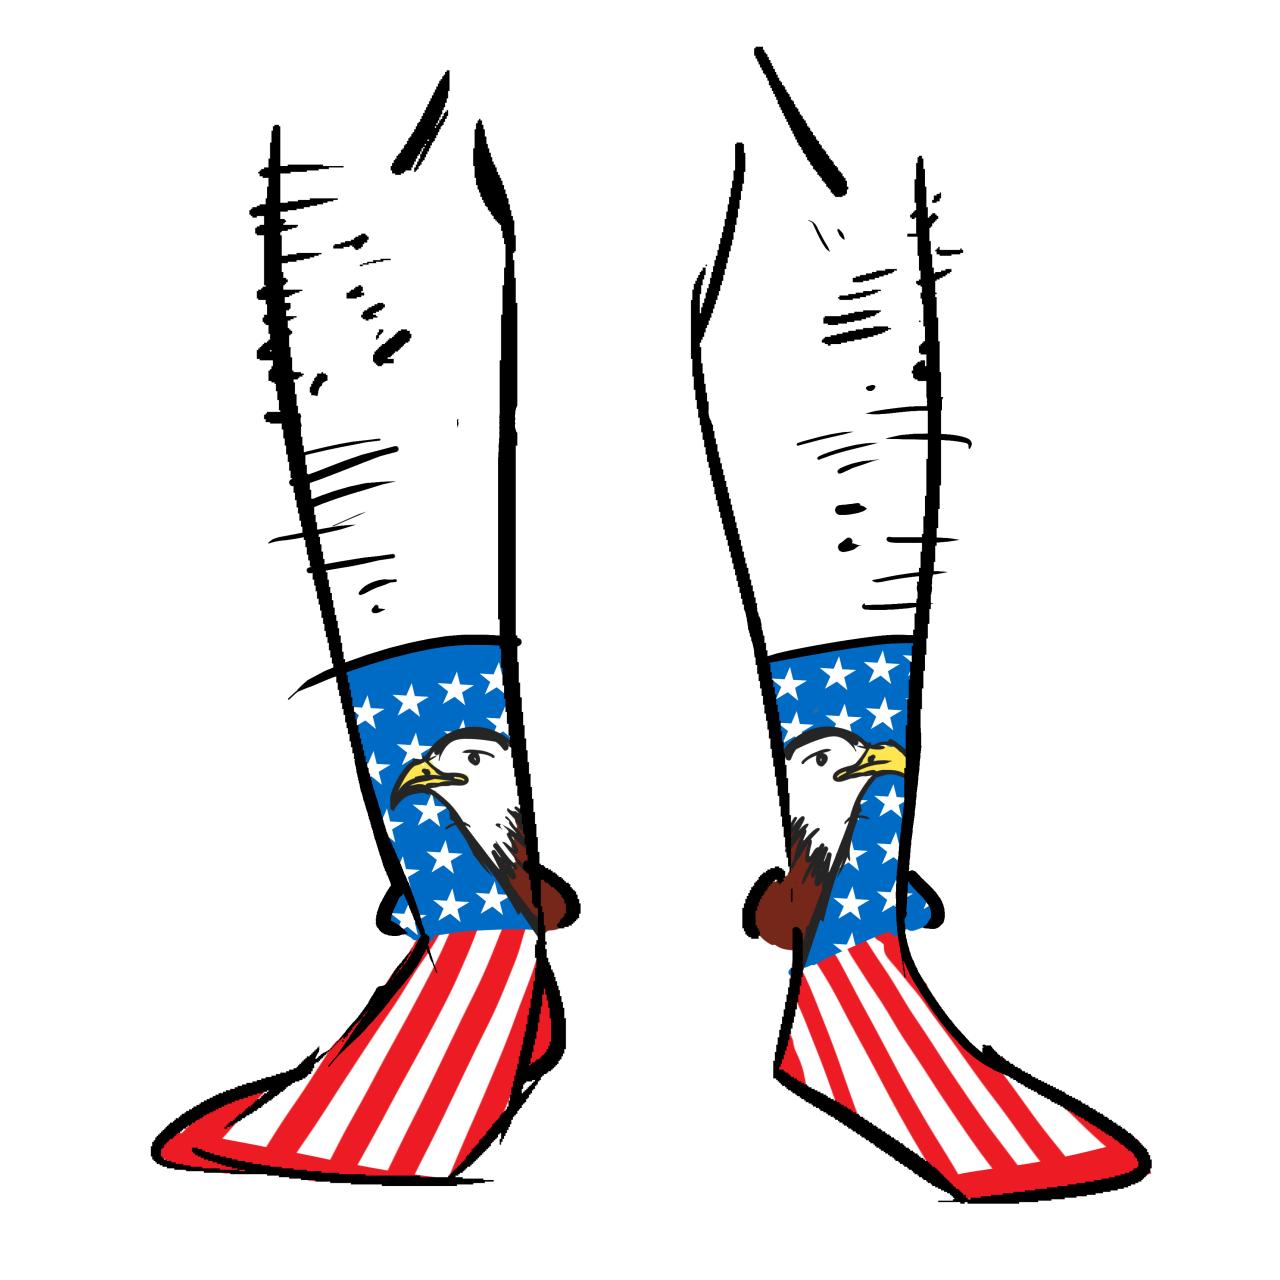 Socks with the USA flag and a bald eagle